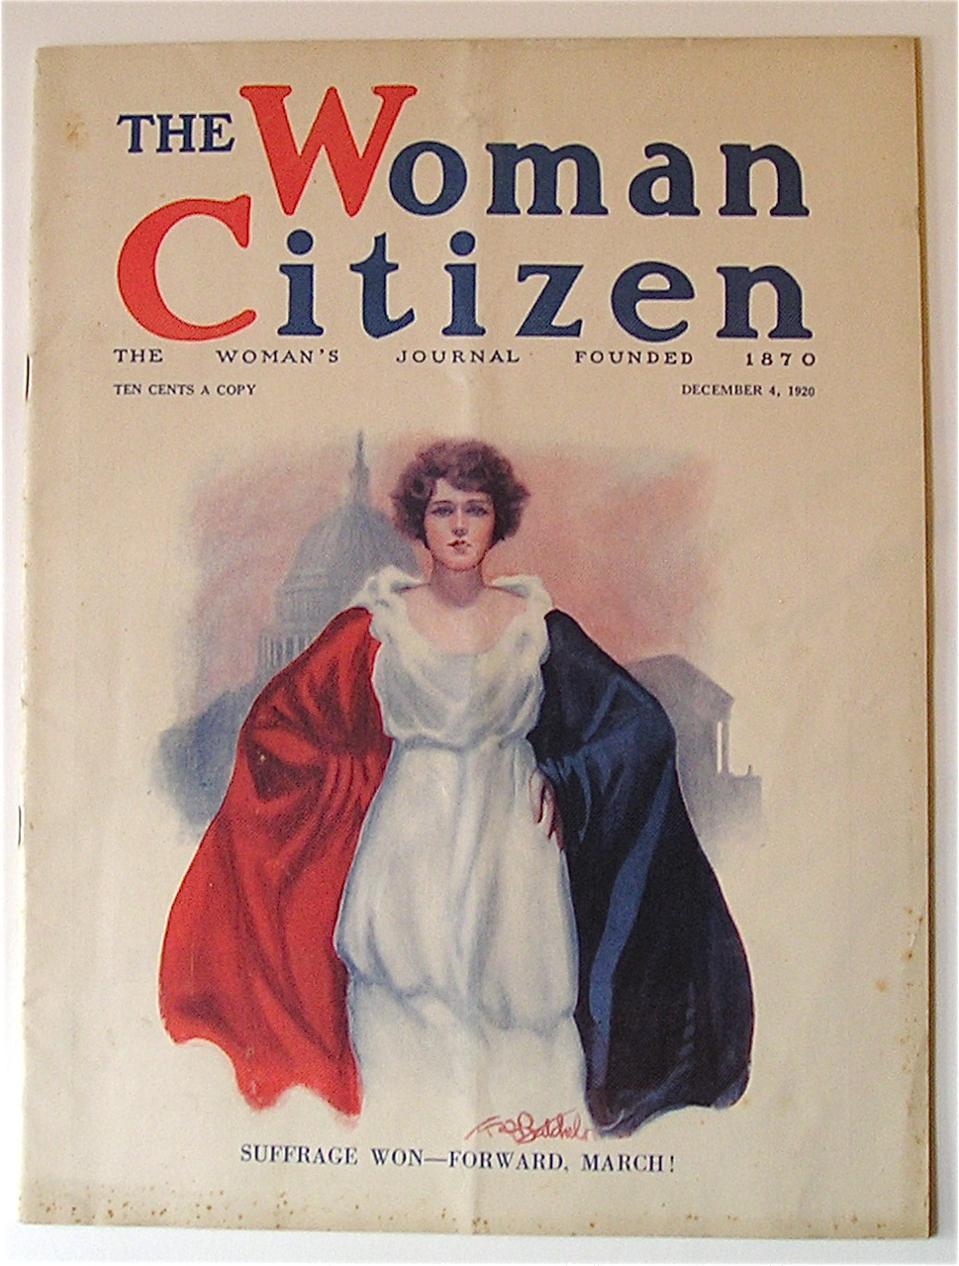 The Woman Citizen, August 1920